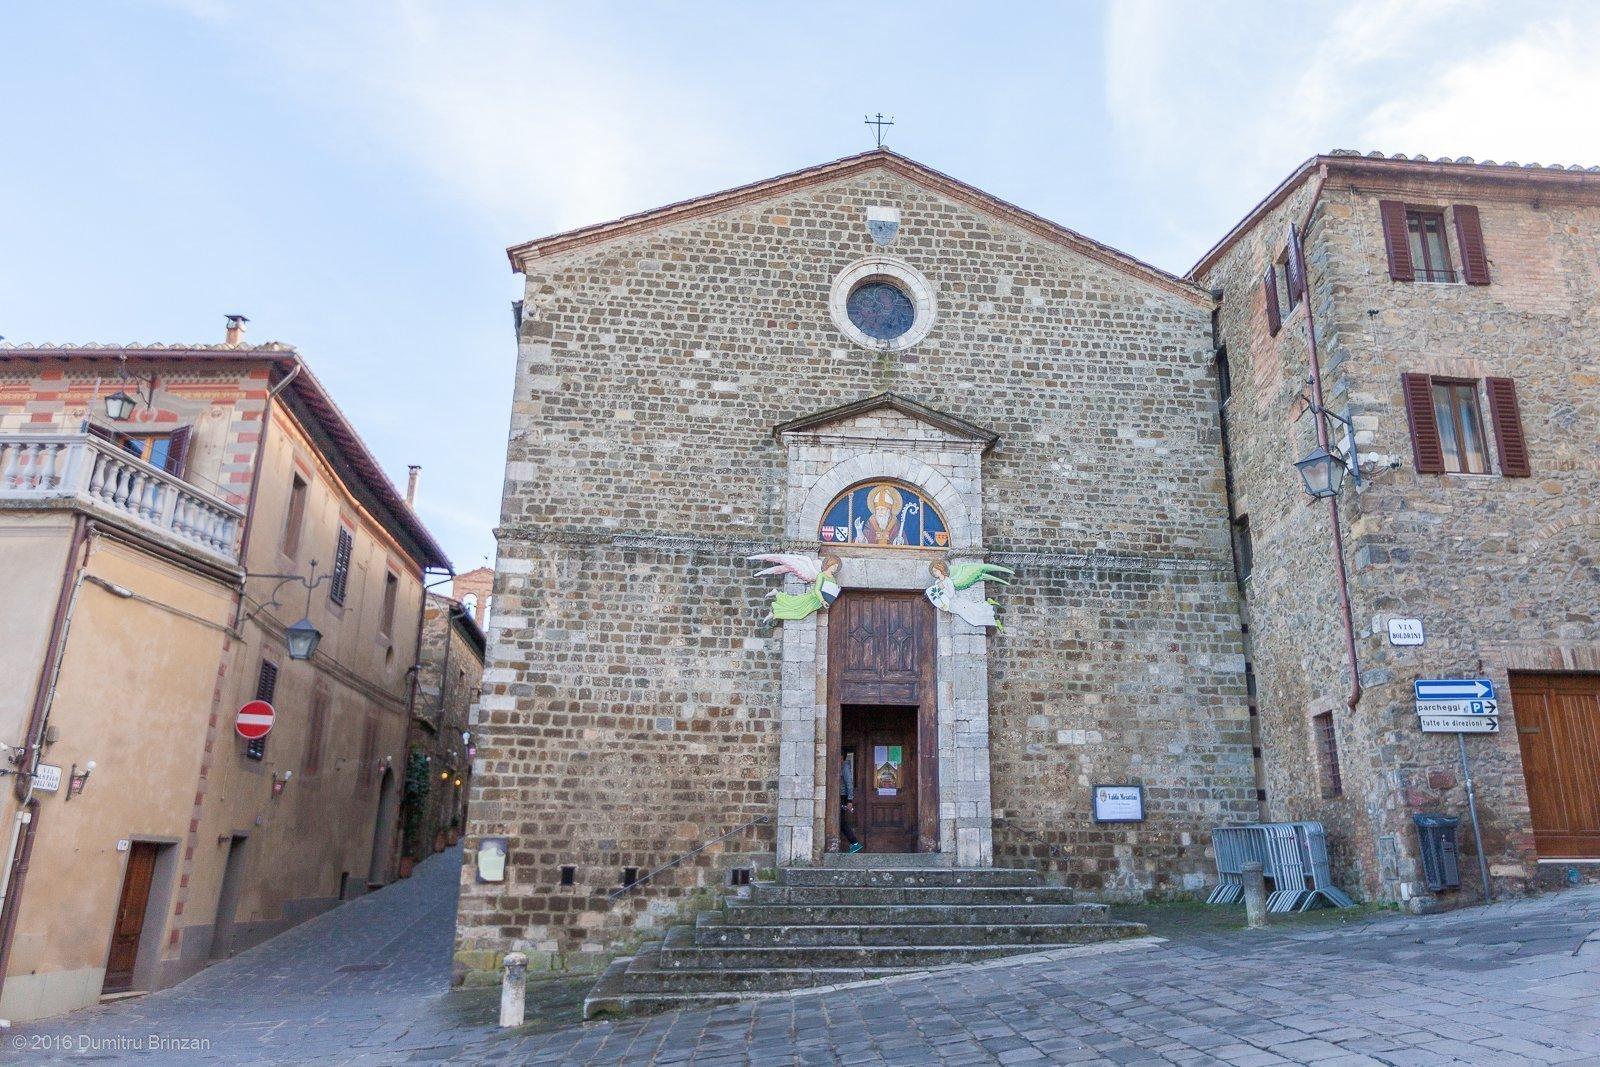 2016-montalcino-tuscany-italy-24-parrocchia-di-s-egidio-abate